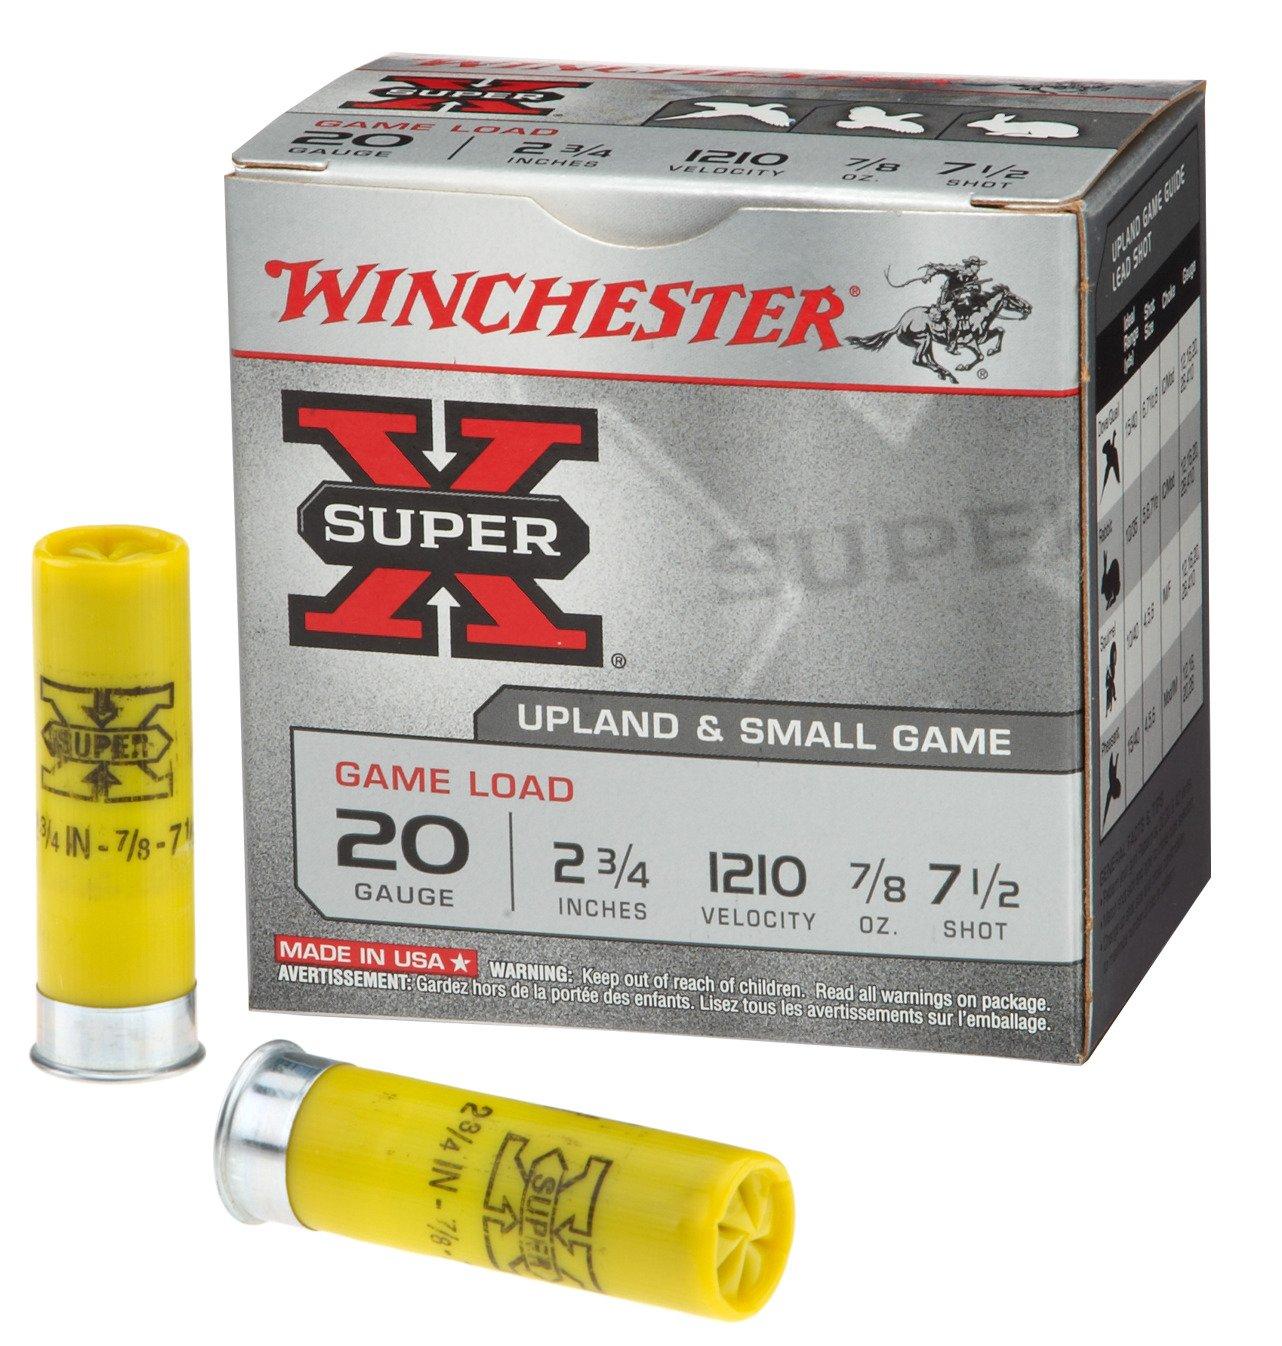 Winchester Super-X 20 Gauge Game Load Shotshells